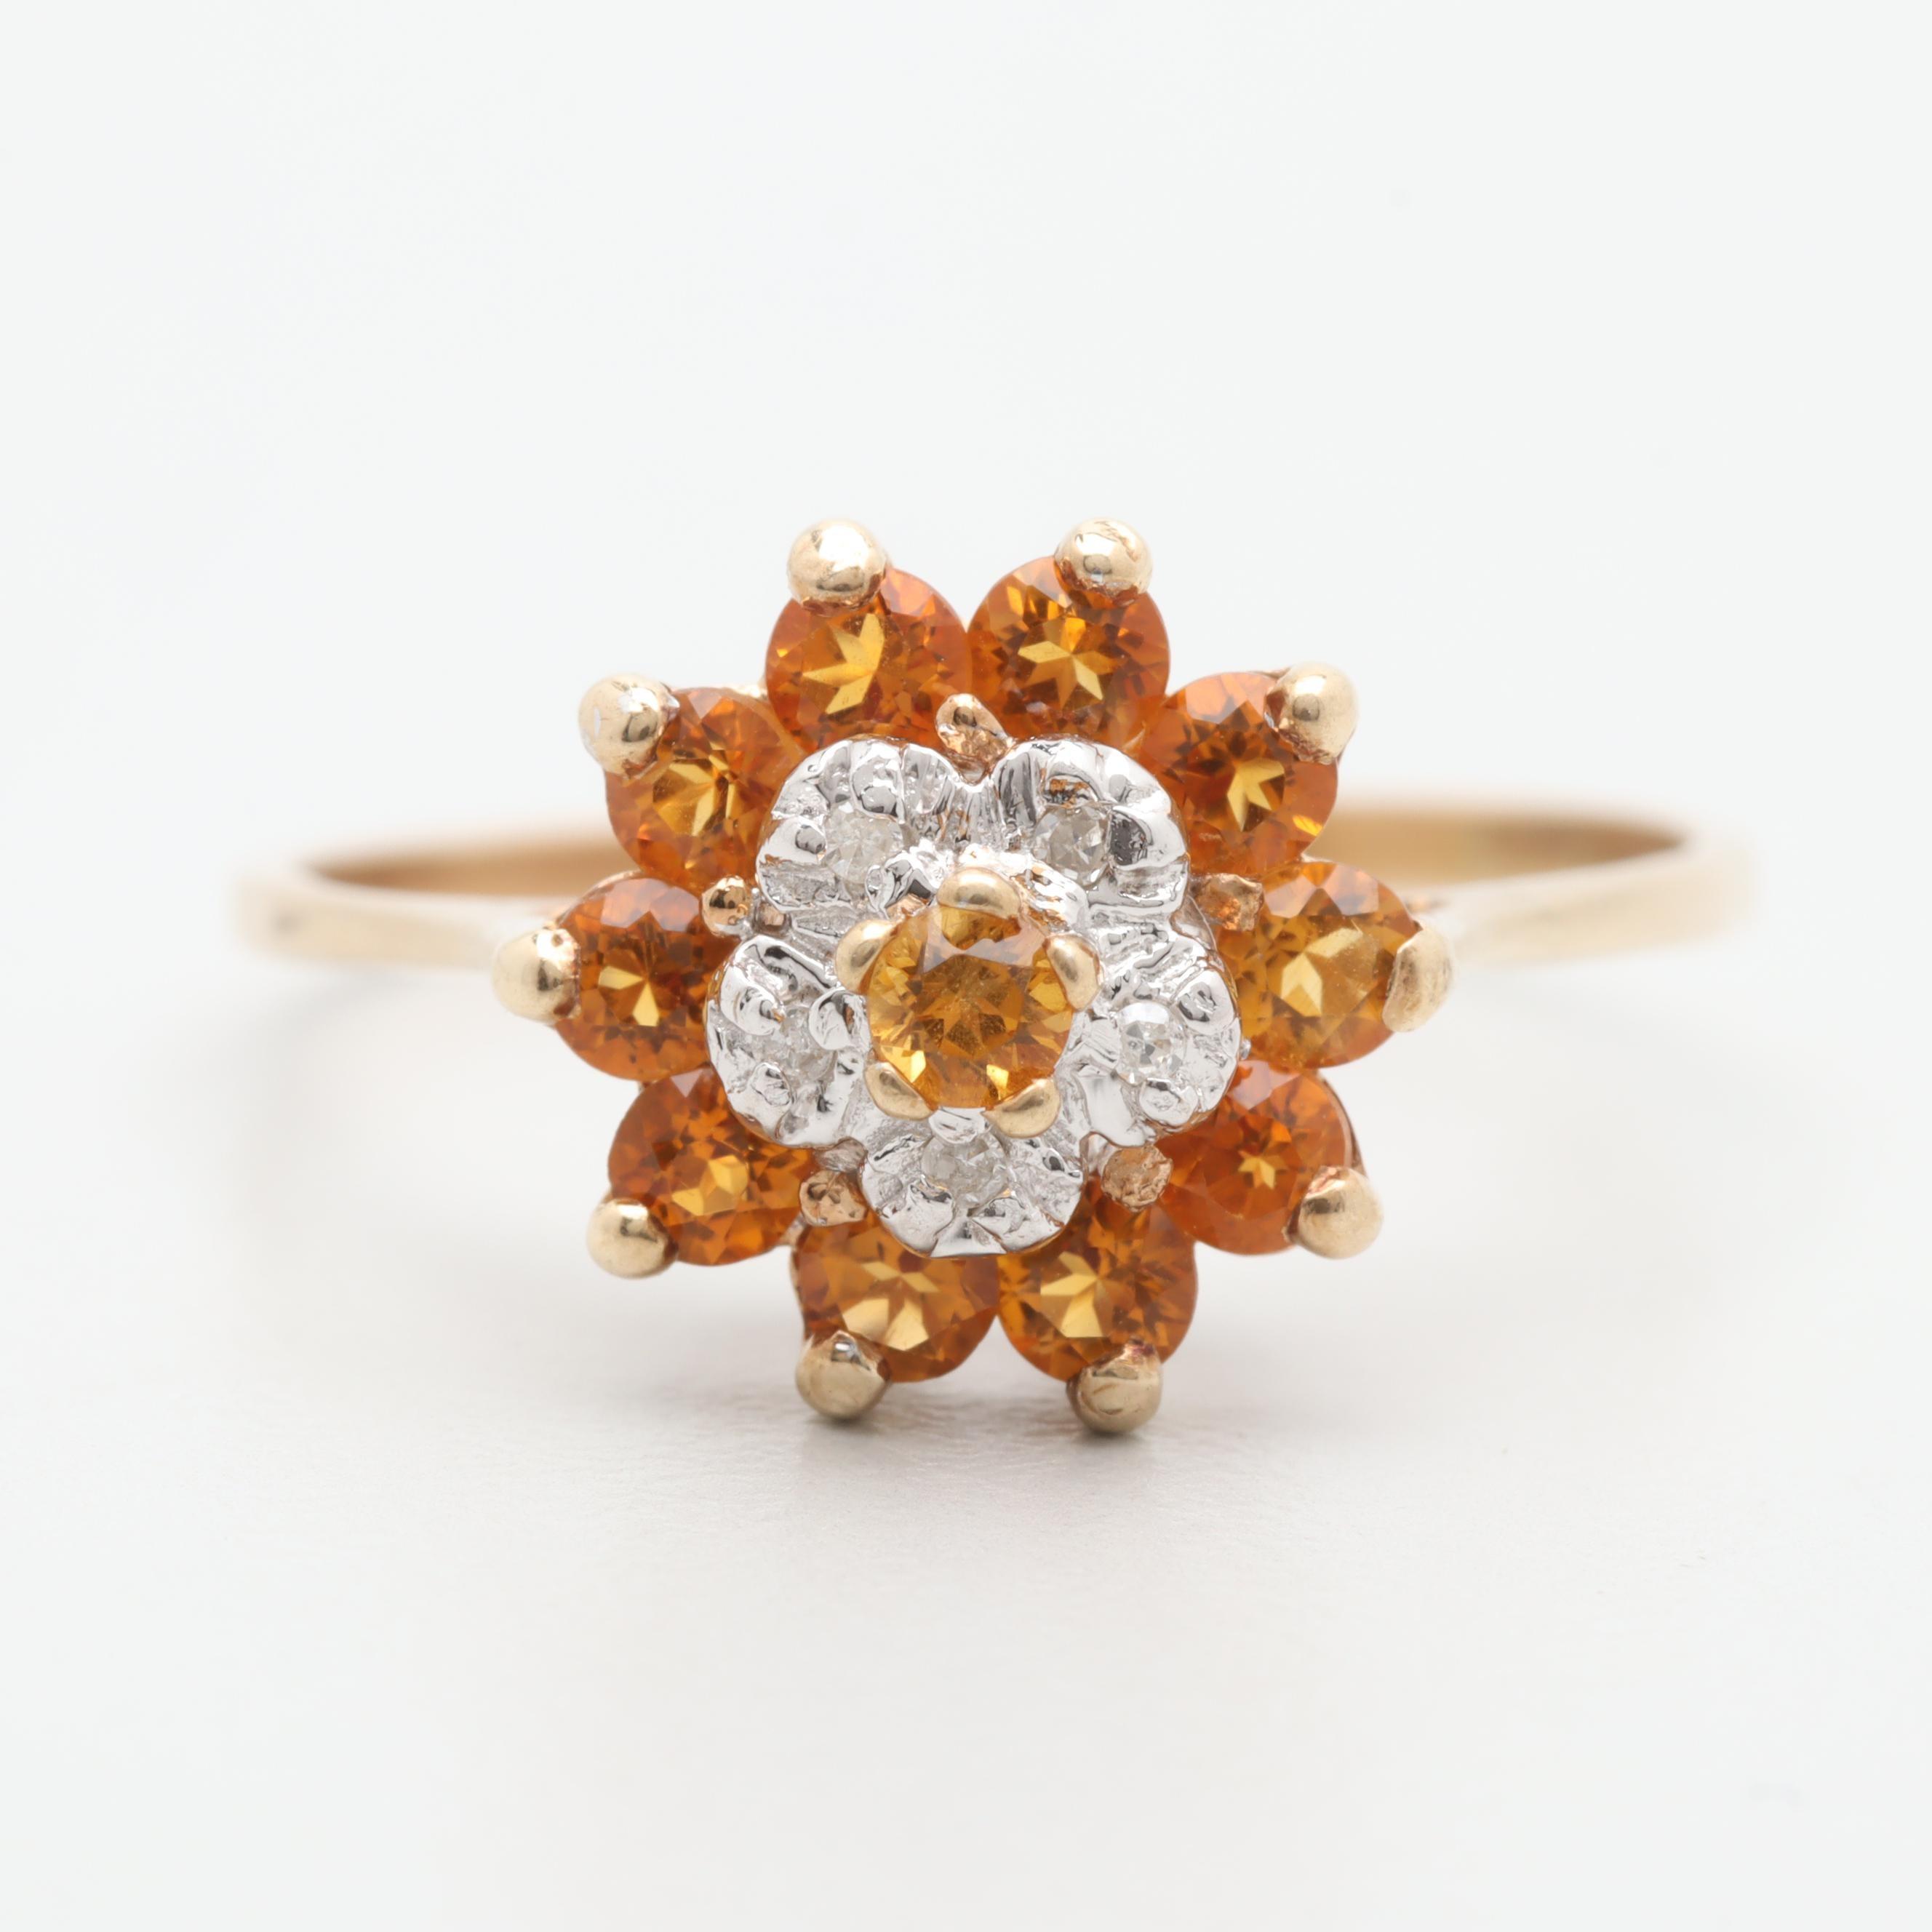 10K Yellow Gold Diamond and Citrine Ring